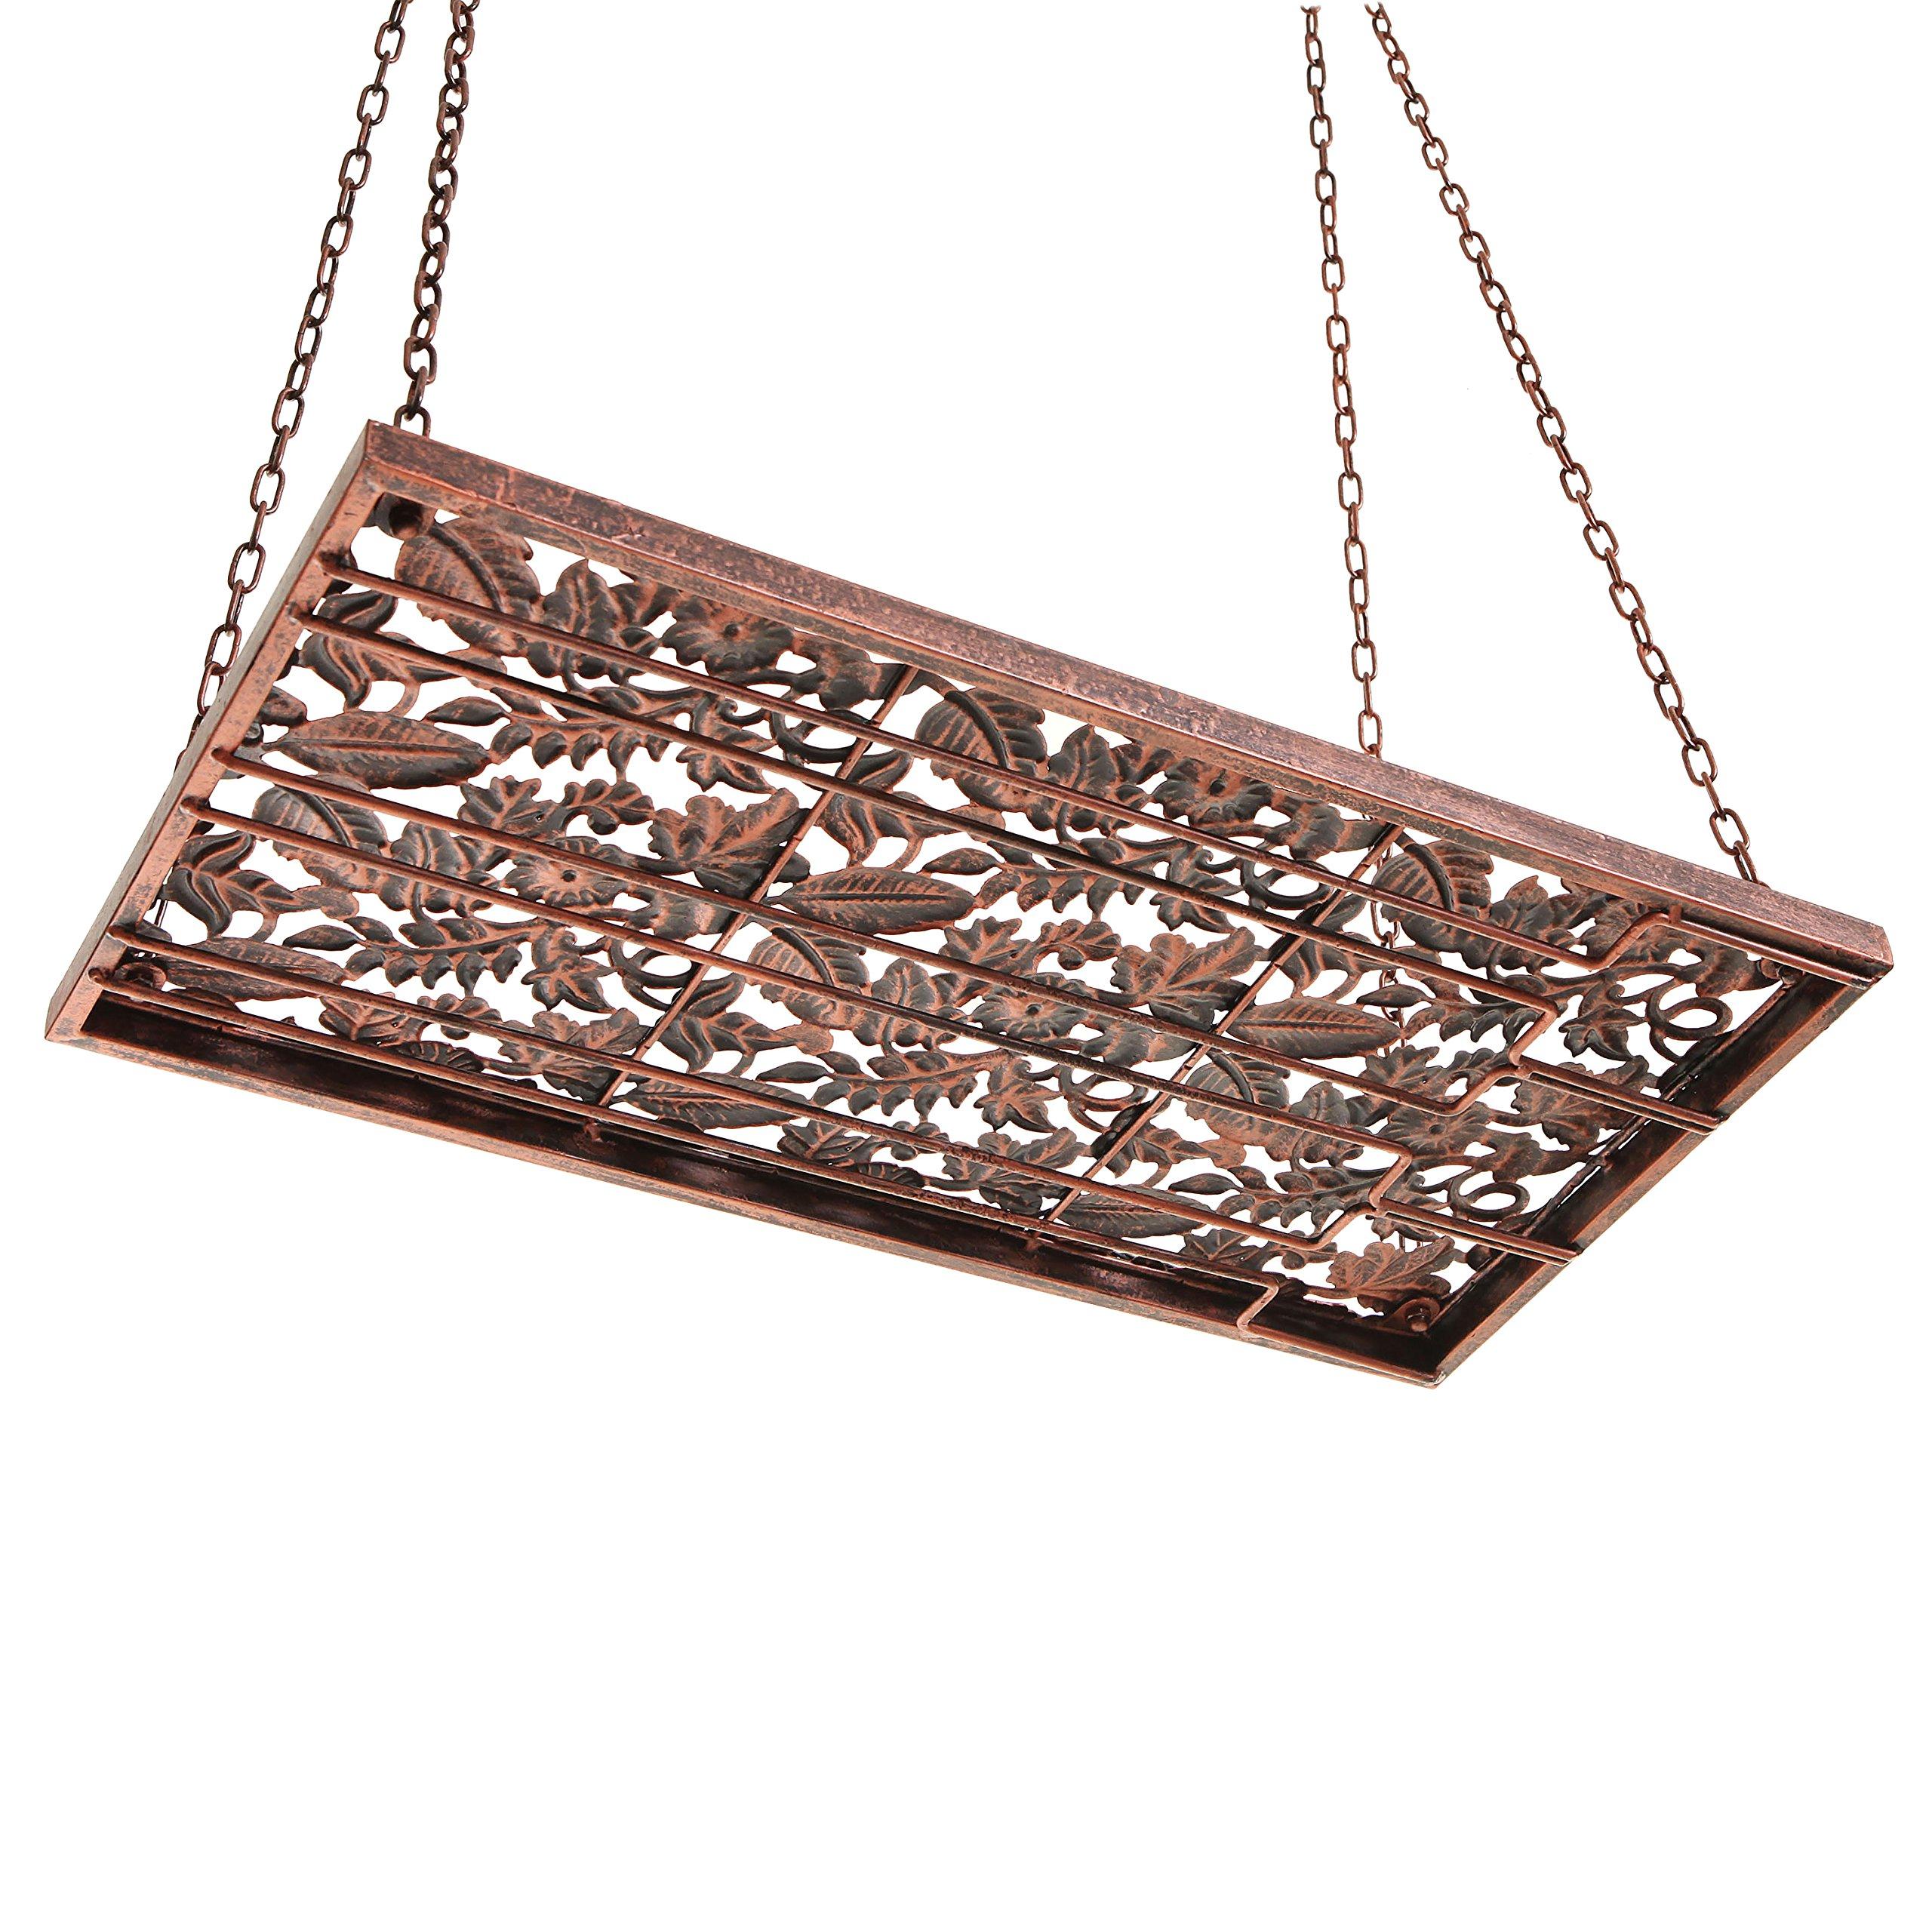 Vineyard Country Rustic Bronze Metal Ceiling Mounted Hanging Stemware Wine Glass Hanger Organizer Rack by MyGift (Image #6)